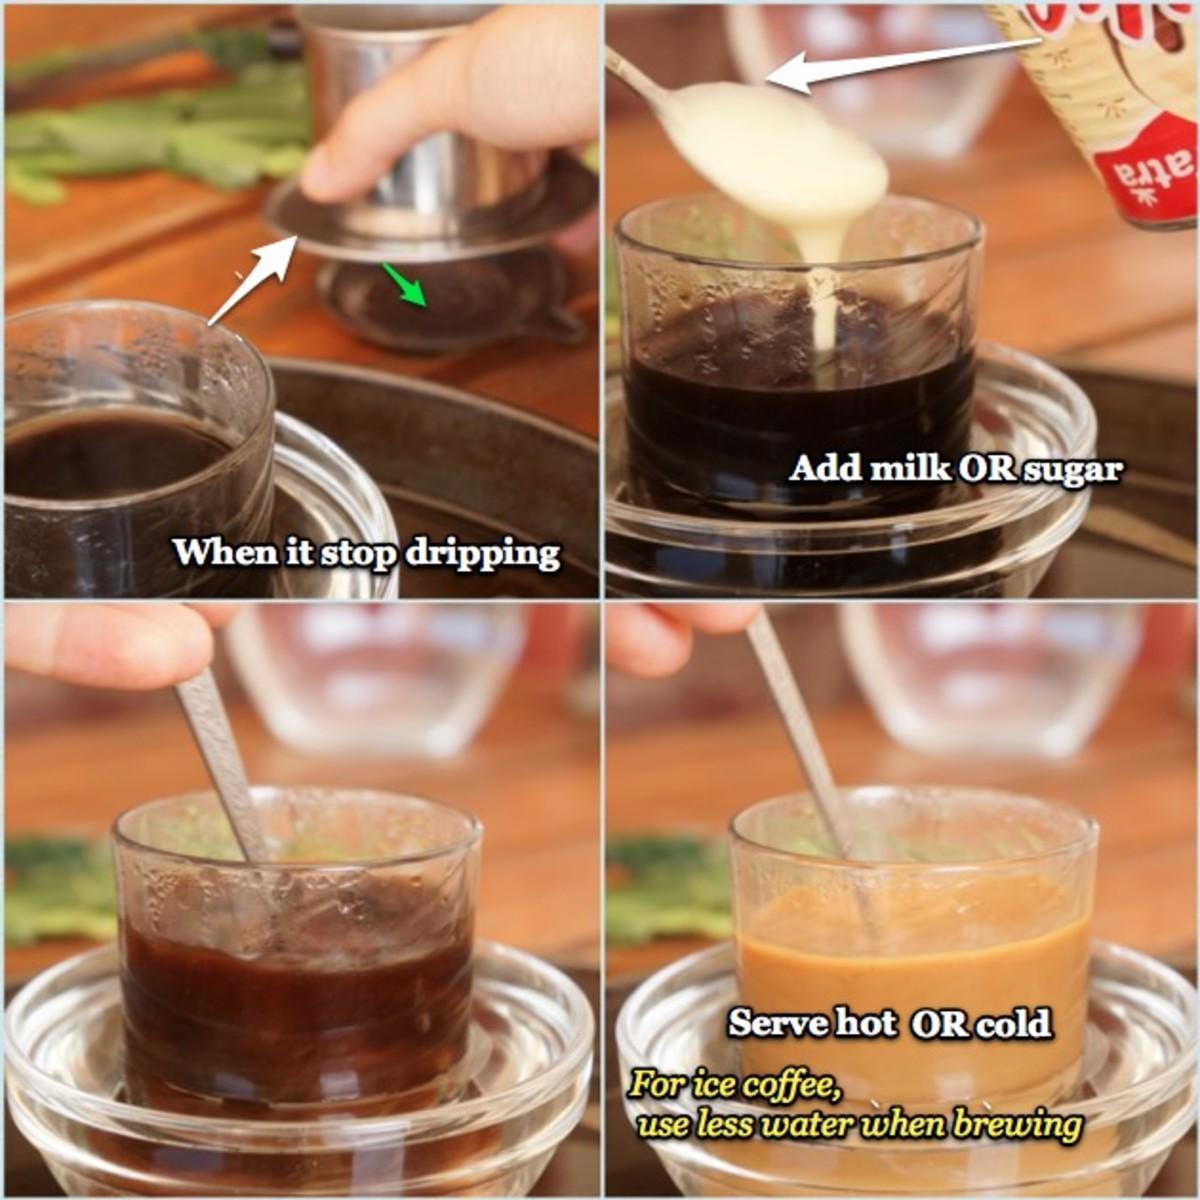 Add condensed milk or sugar, serve hot or cold.